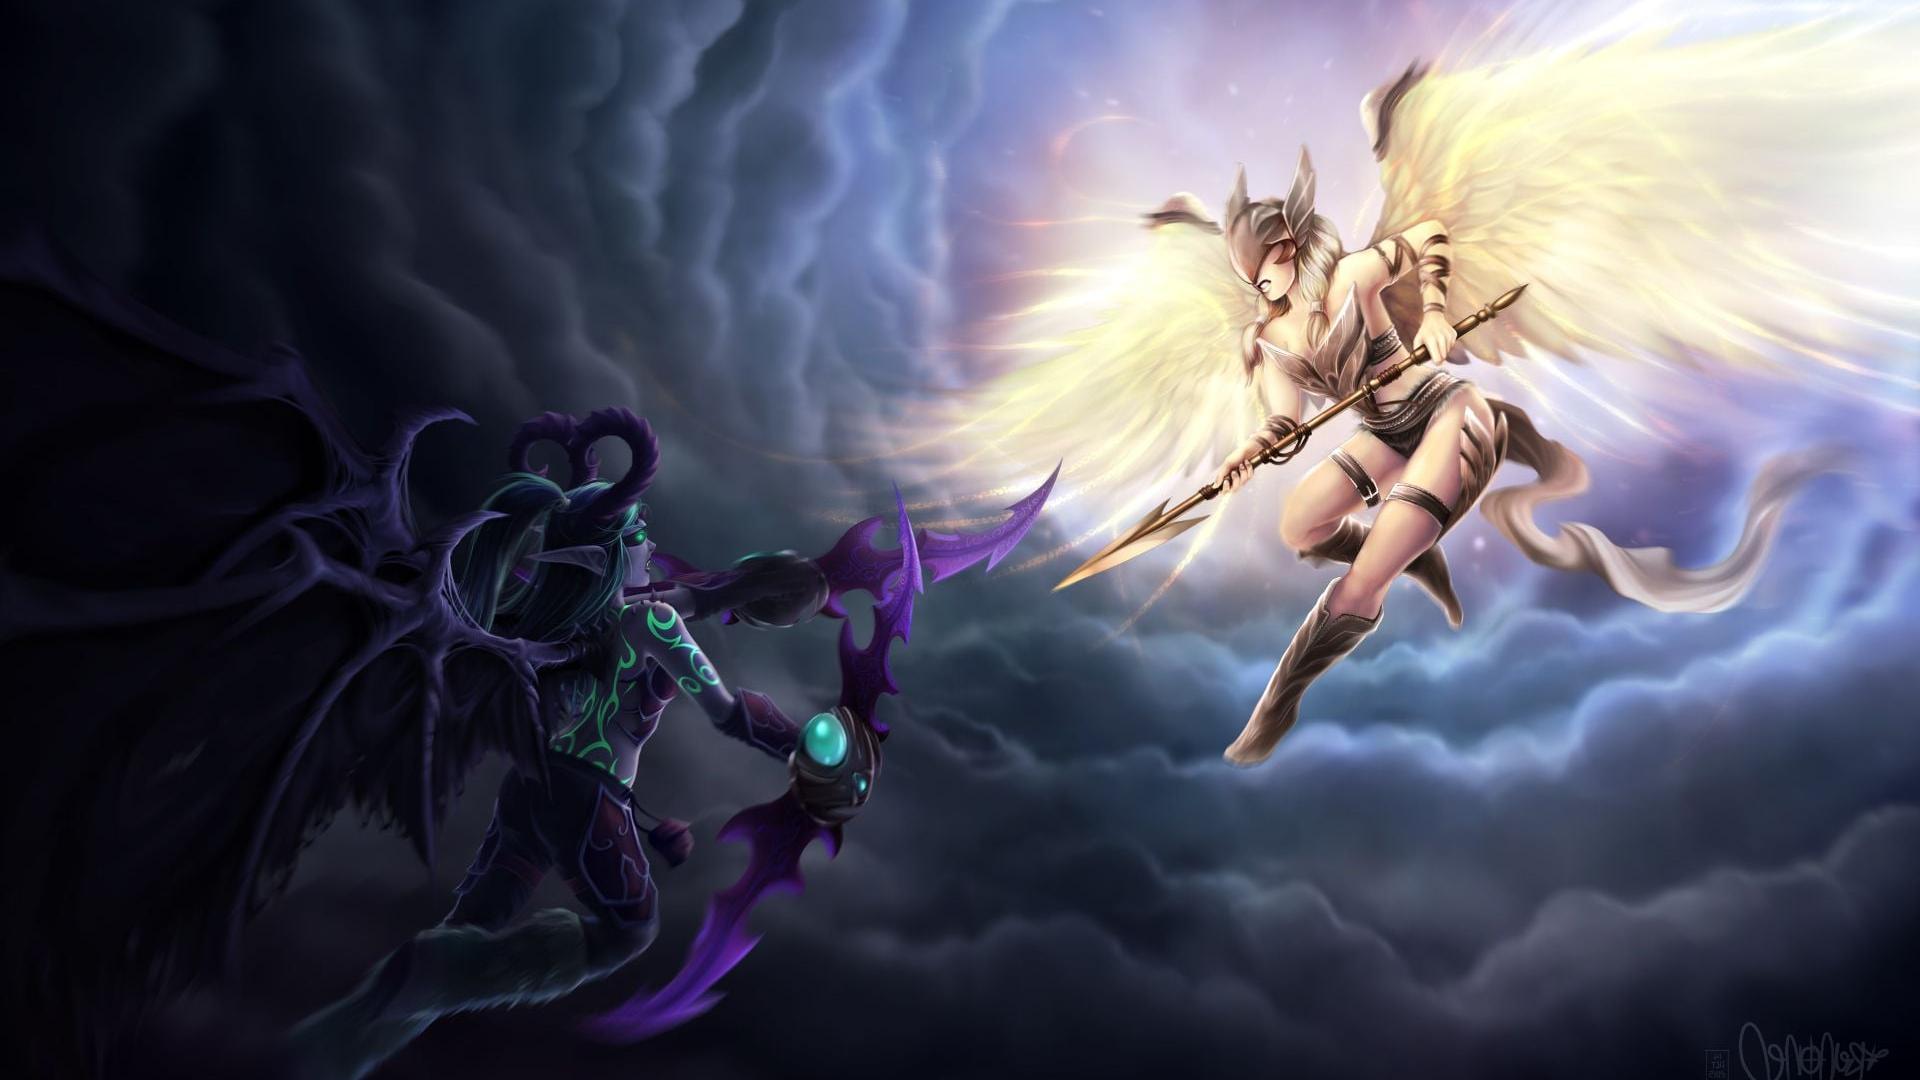 Free Download Wallpaper Of Demon Hunter World Of Warcraft Legion